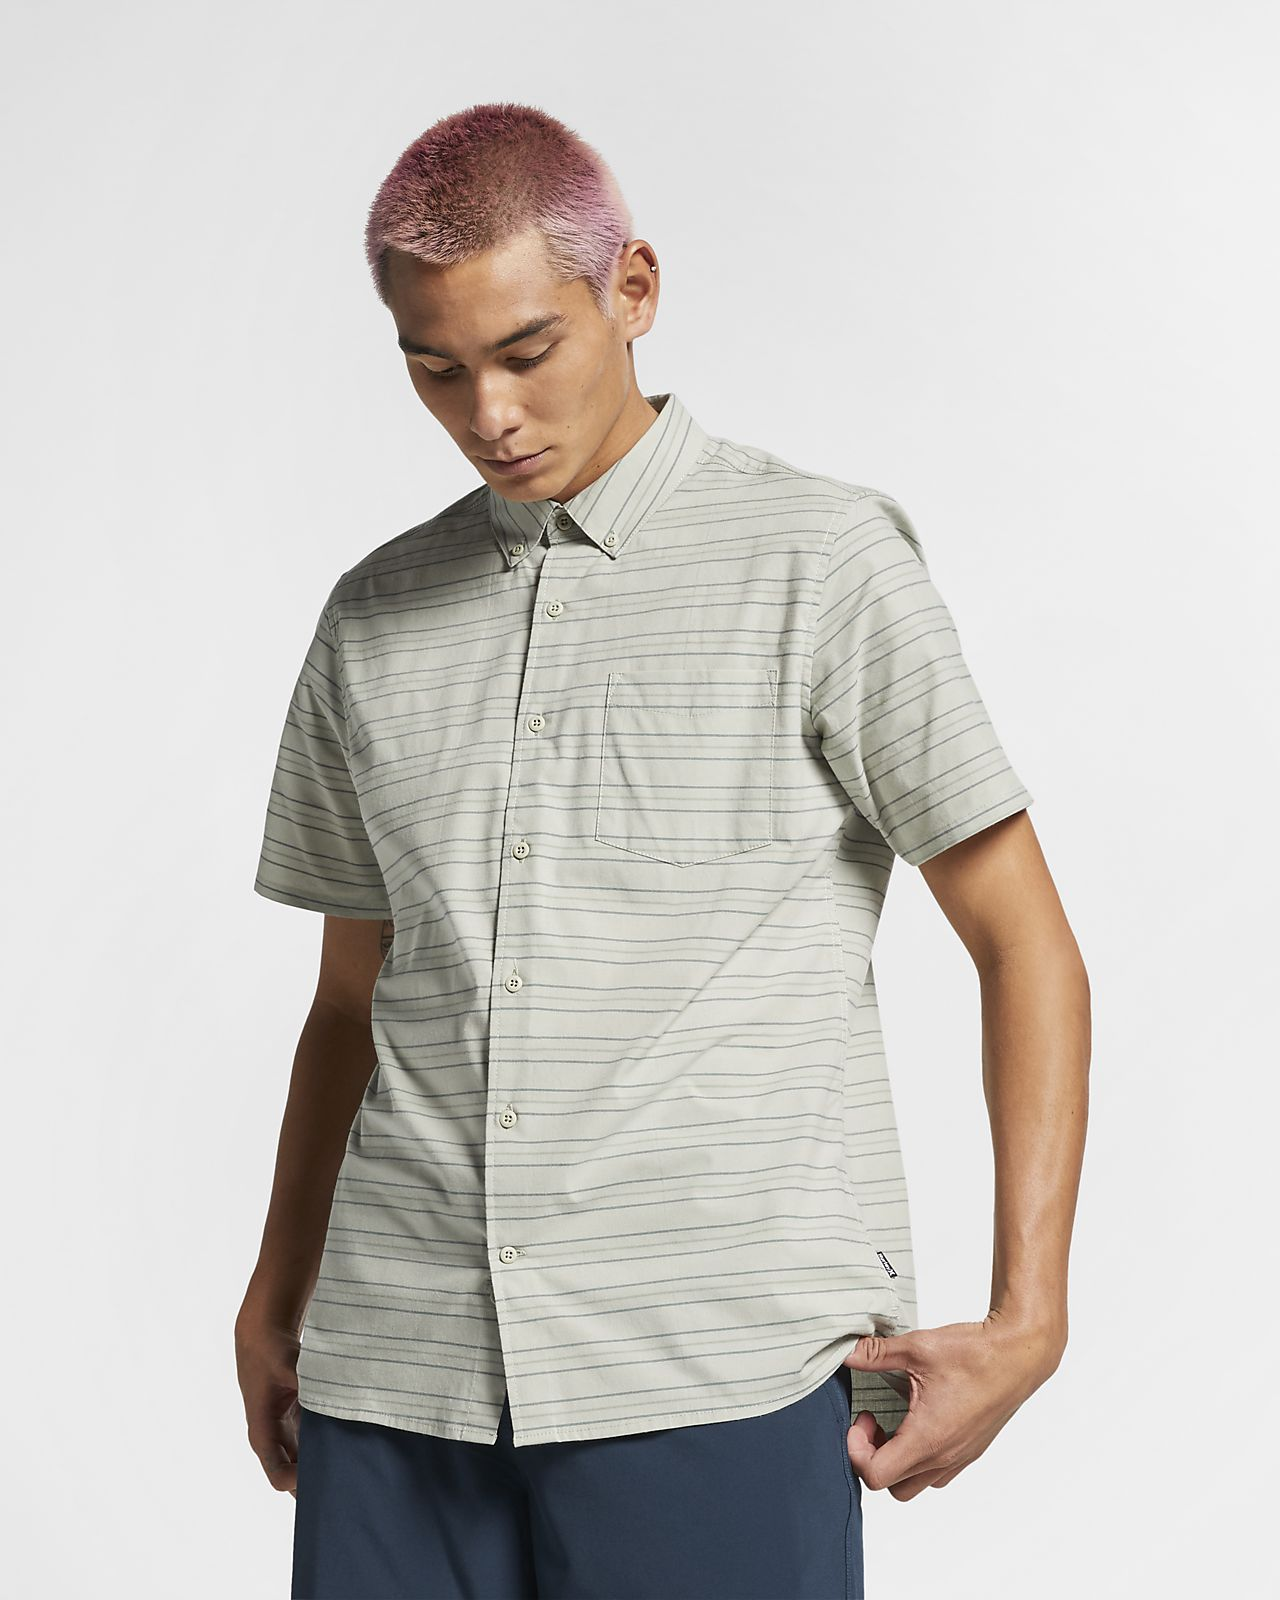 Chemise à manches courtes Hurley Dri-FIT Staycay pour Homme